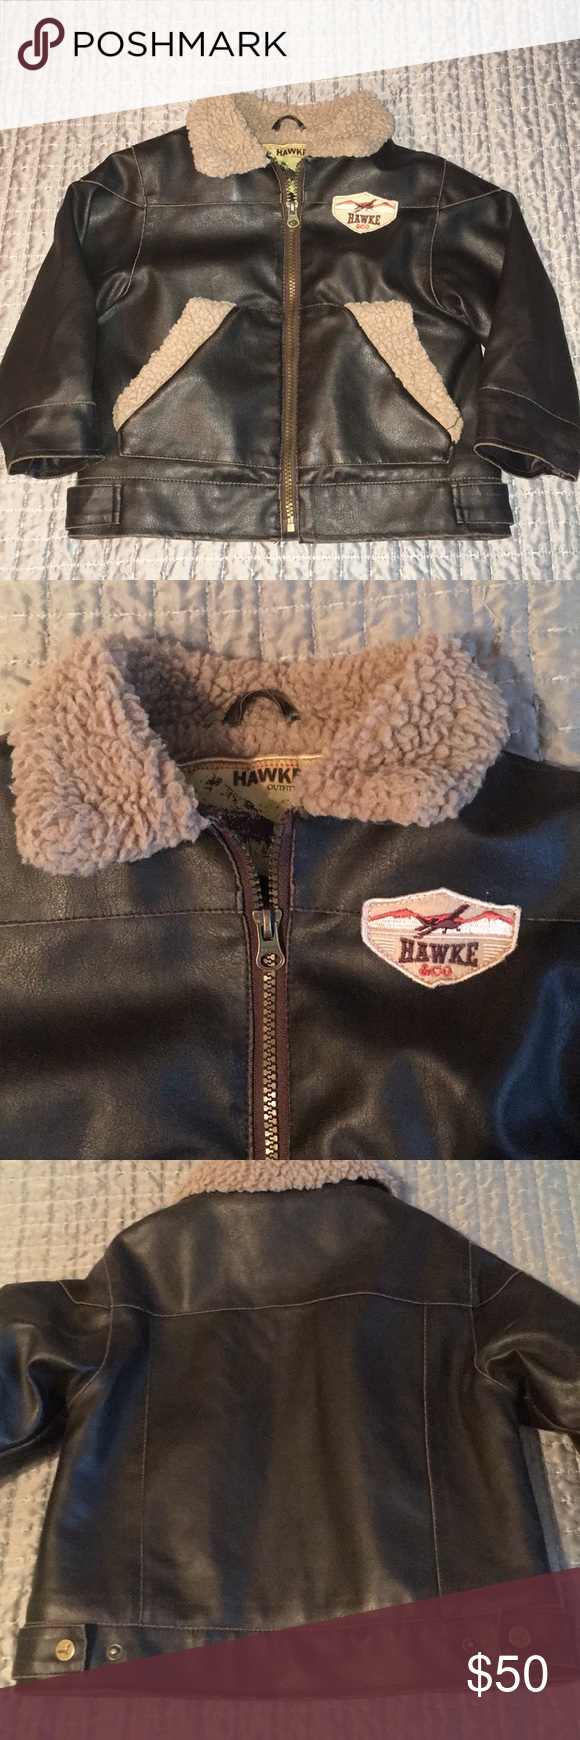 Hawke Co Vegan Leather Brown Bomber Jacket Worn Once For Pics Hawke Co Faux Leather Bomber Jacket Brown Bomber Jacket Faux Leather Bomber Jacket Jackets [ 1740 x 580 Pixel ]